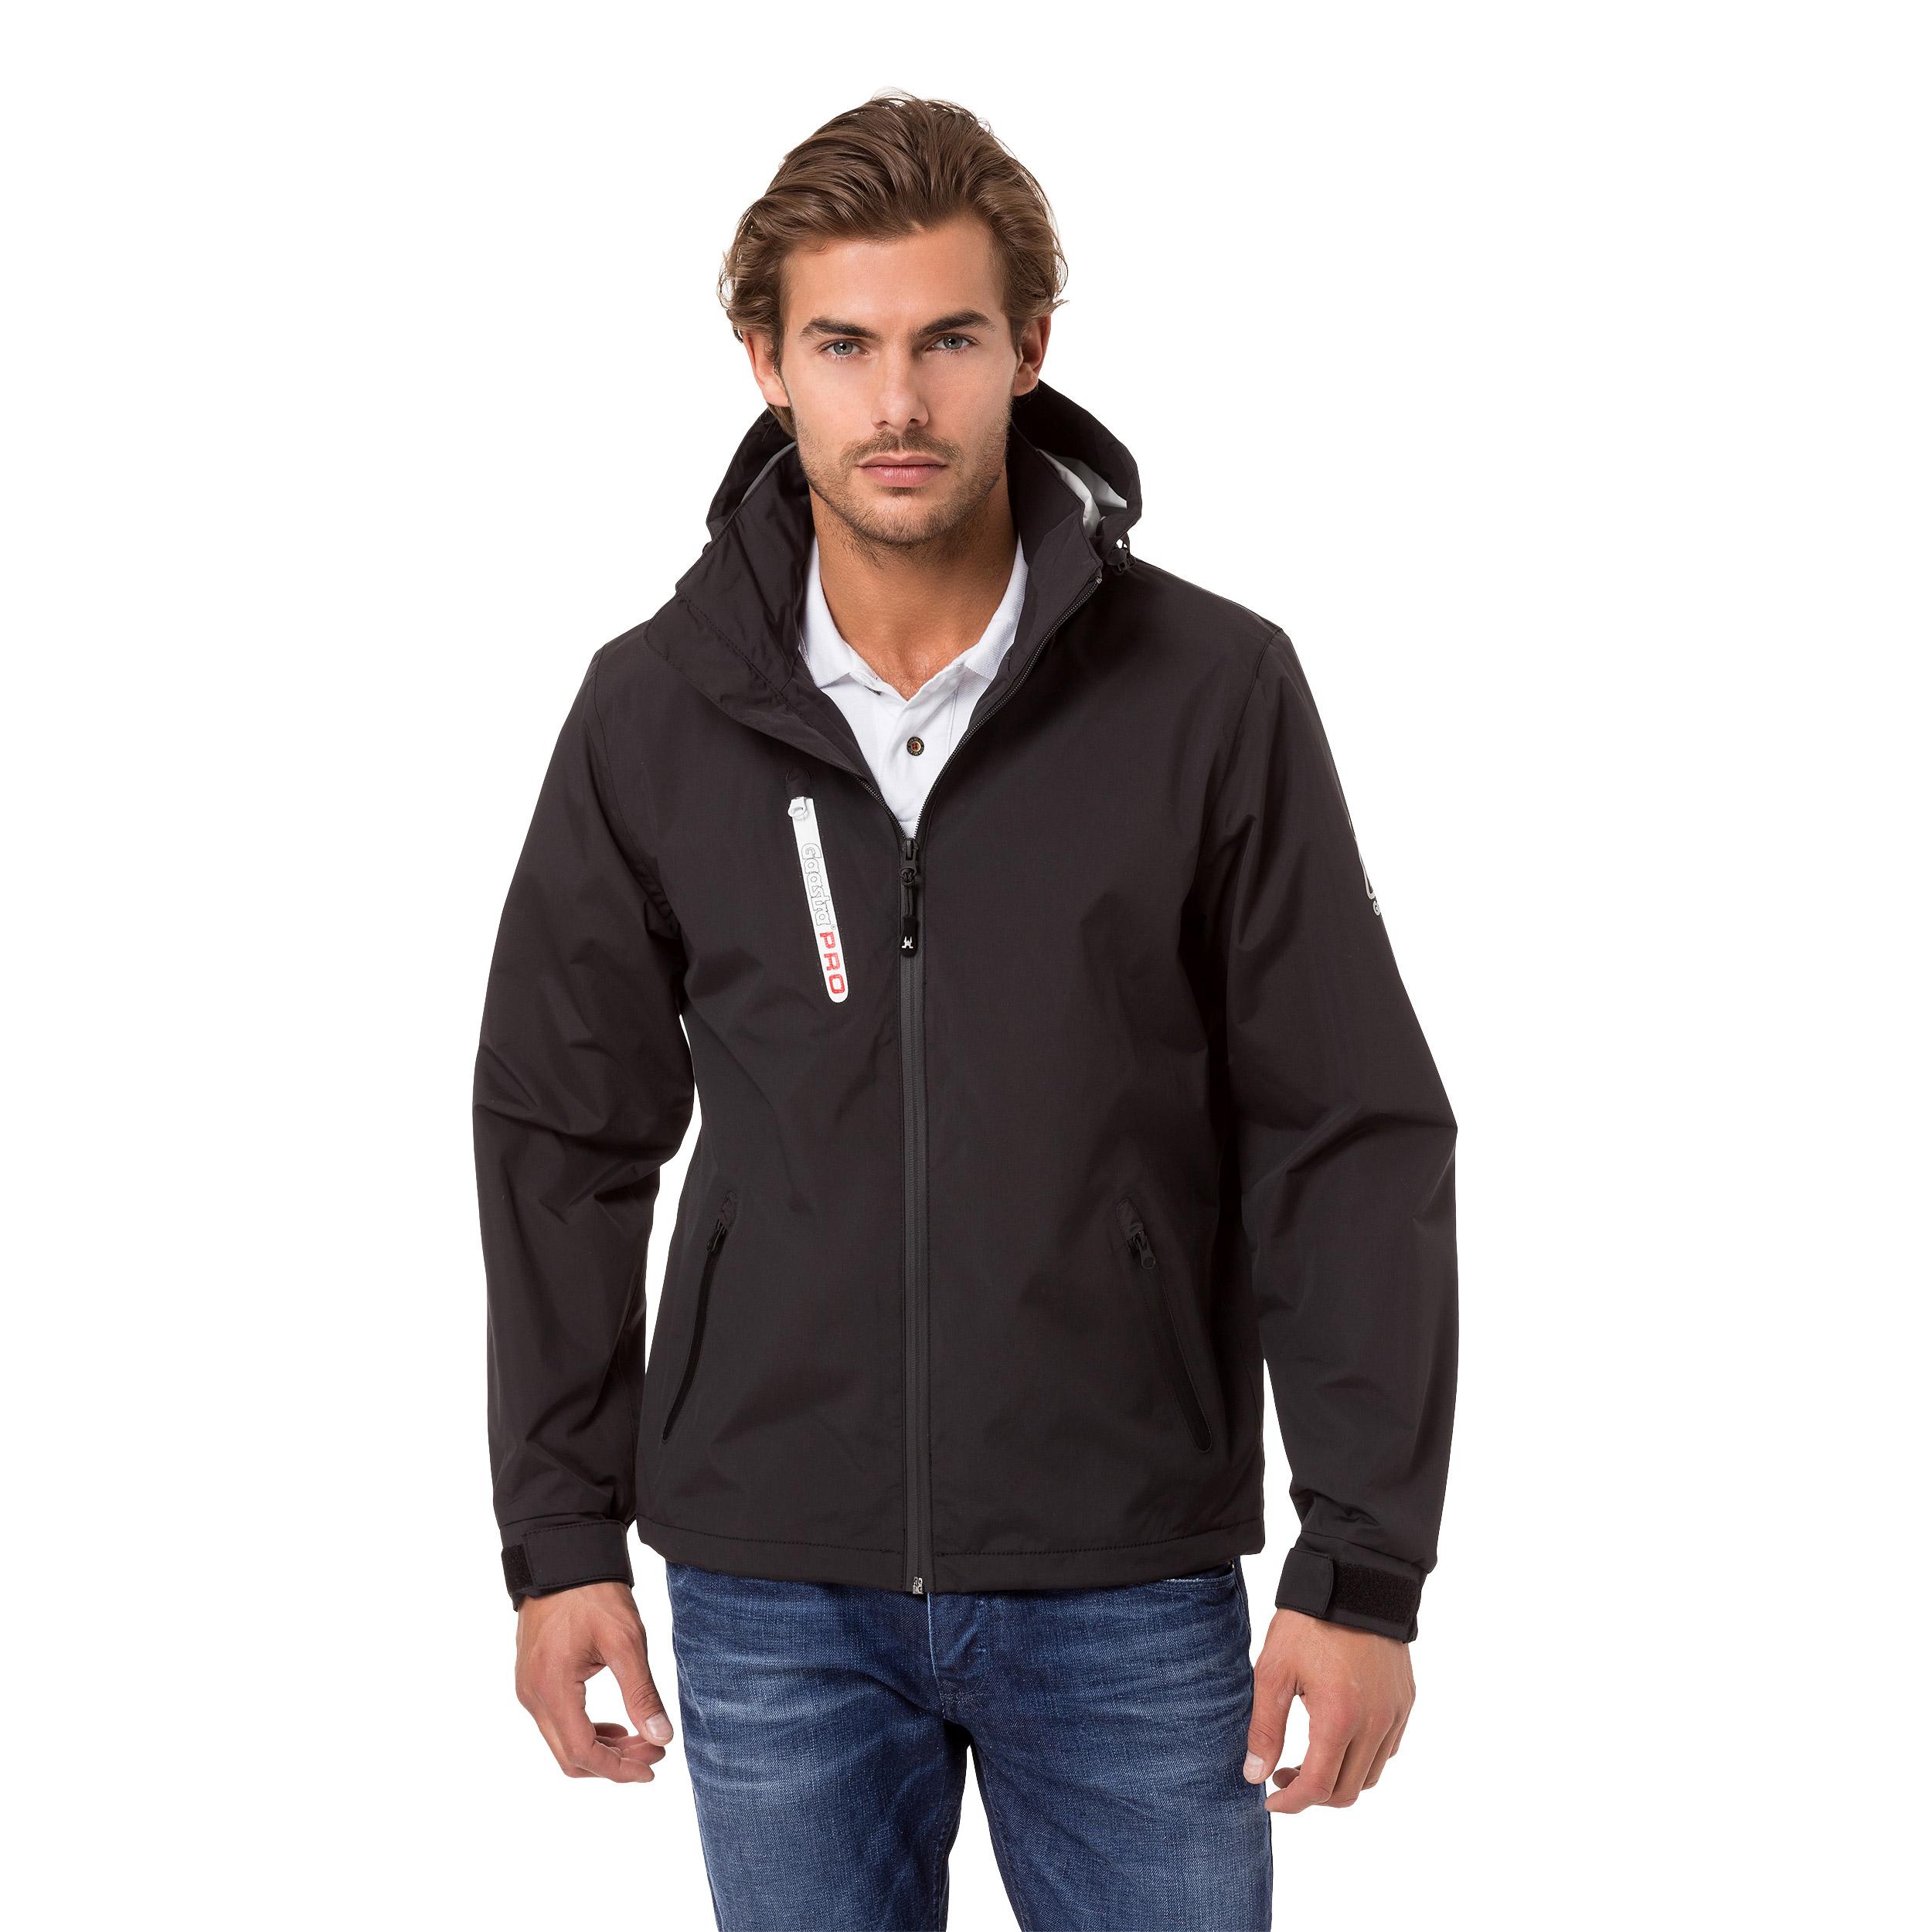 7291a42a046 Jacket Key West Men - Clothes for sailing